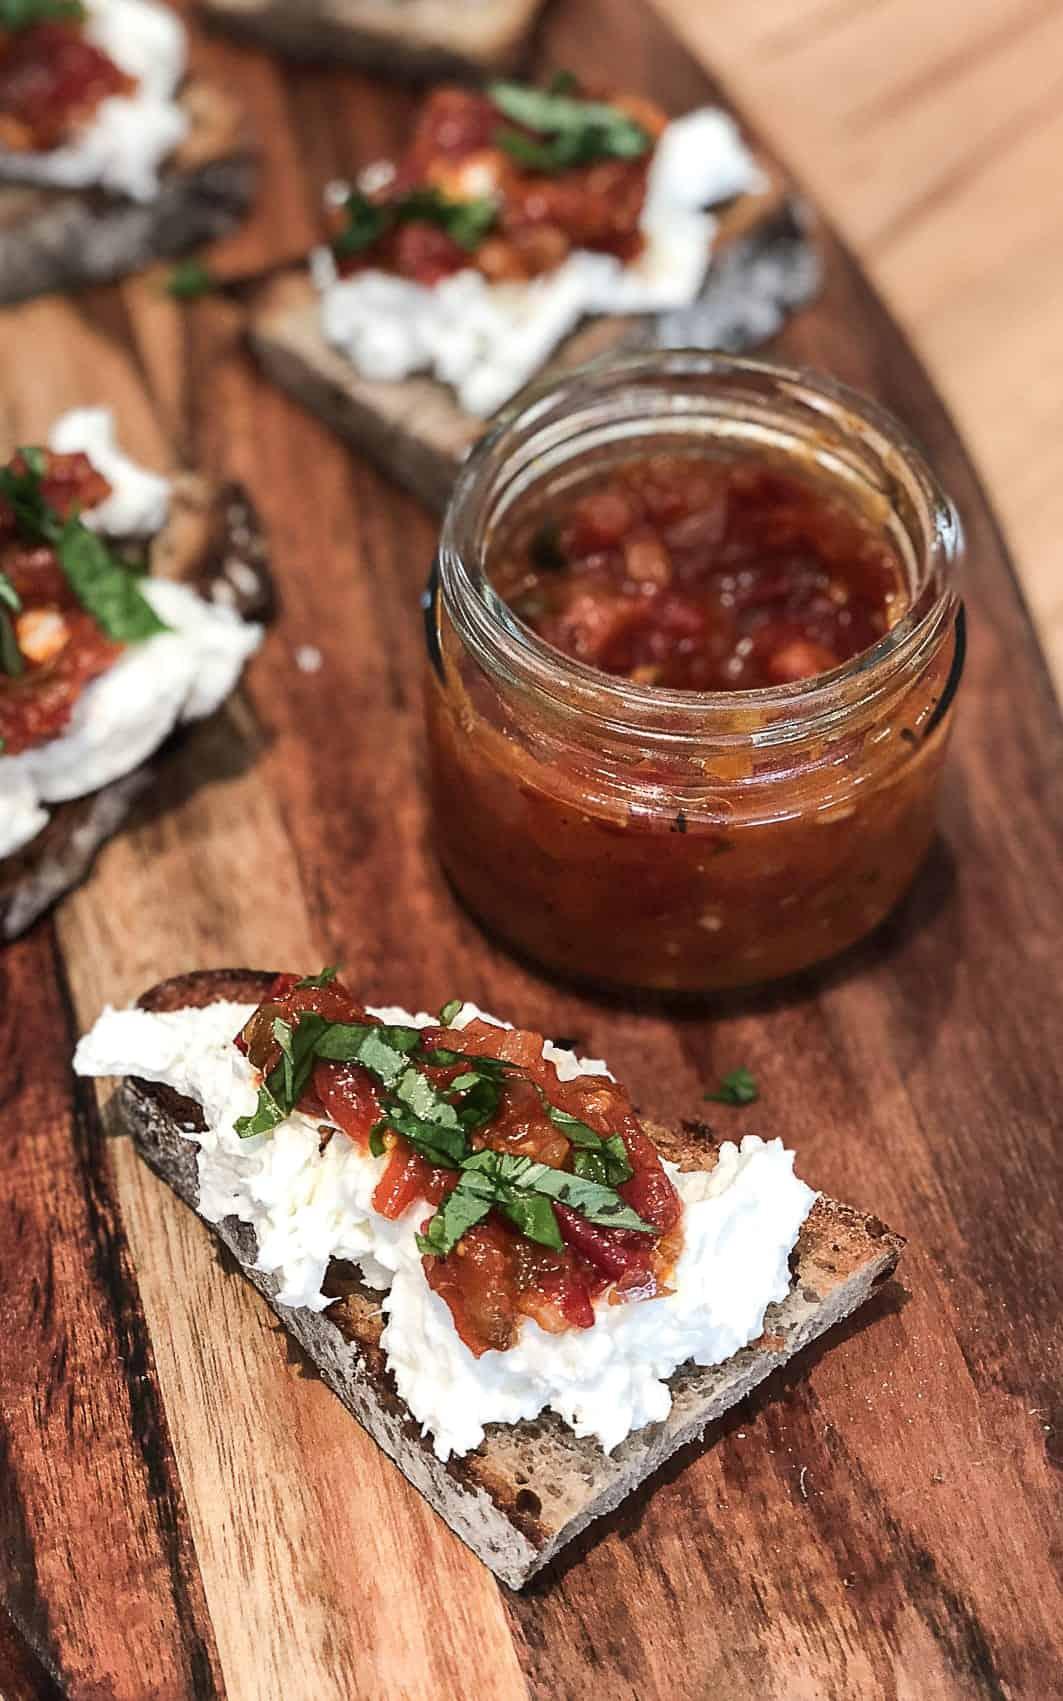 Tomatenmarmelade mit Salzkapern | afba18 | SOAP|KITCHEN|STYLE